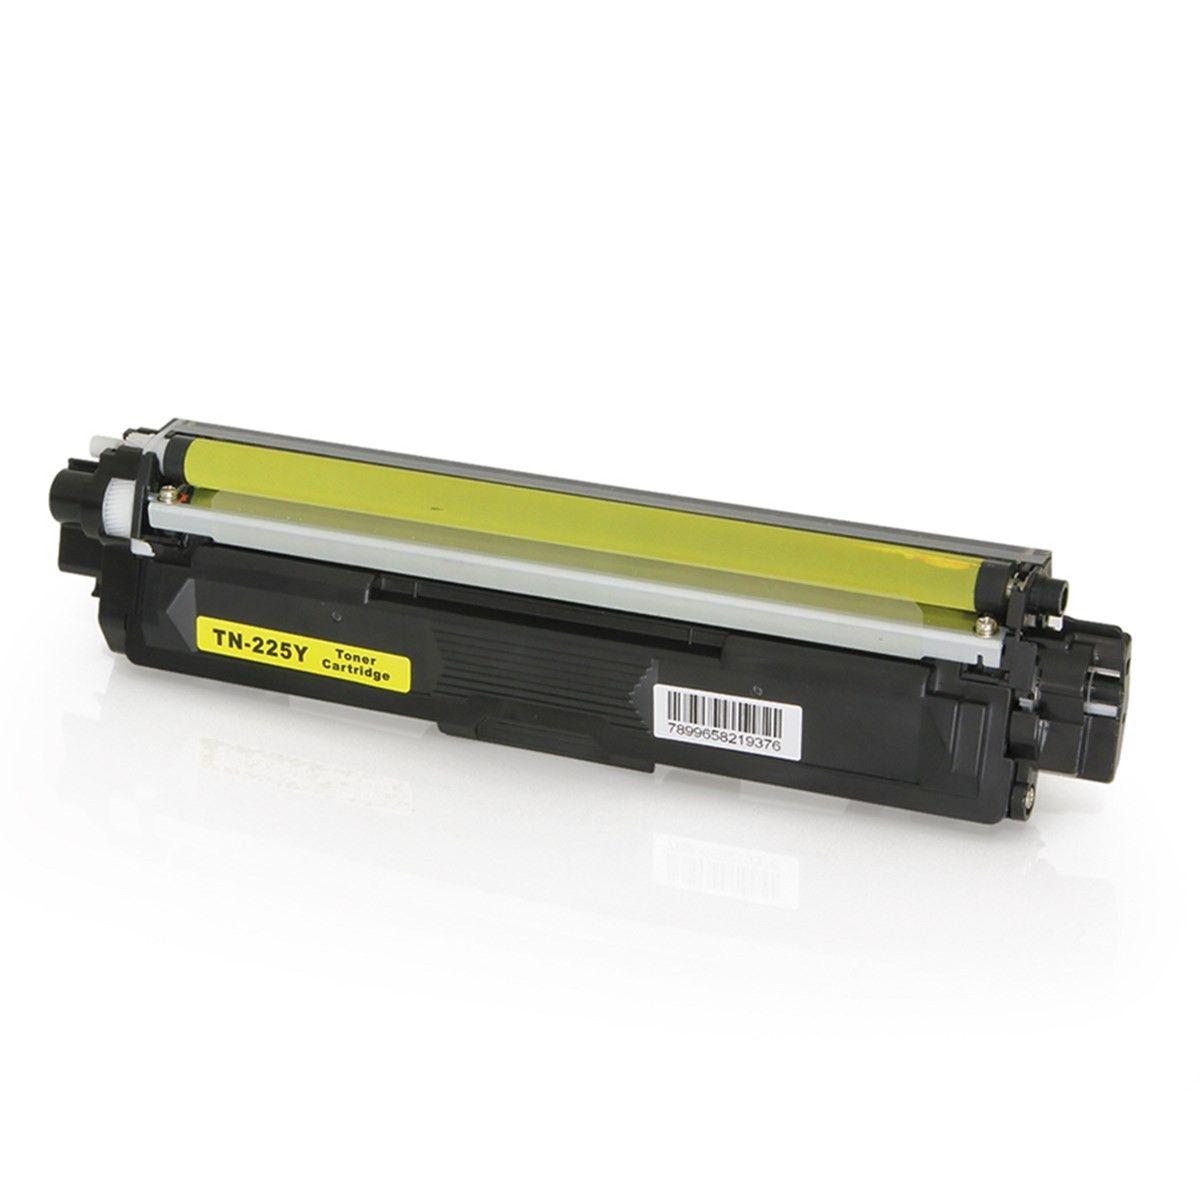 Toner compatível com BROTHER TN-225Y TN225 HL3170 MFC9130 HL3140 MFC9020 Yellow 2.200 Páginas - Cartucho & Cia